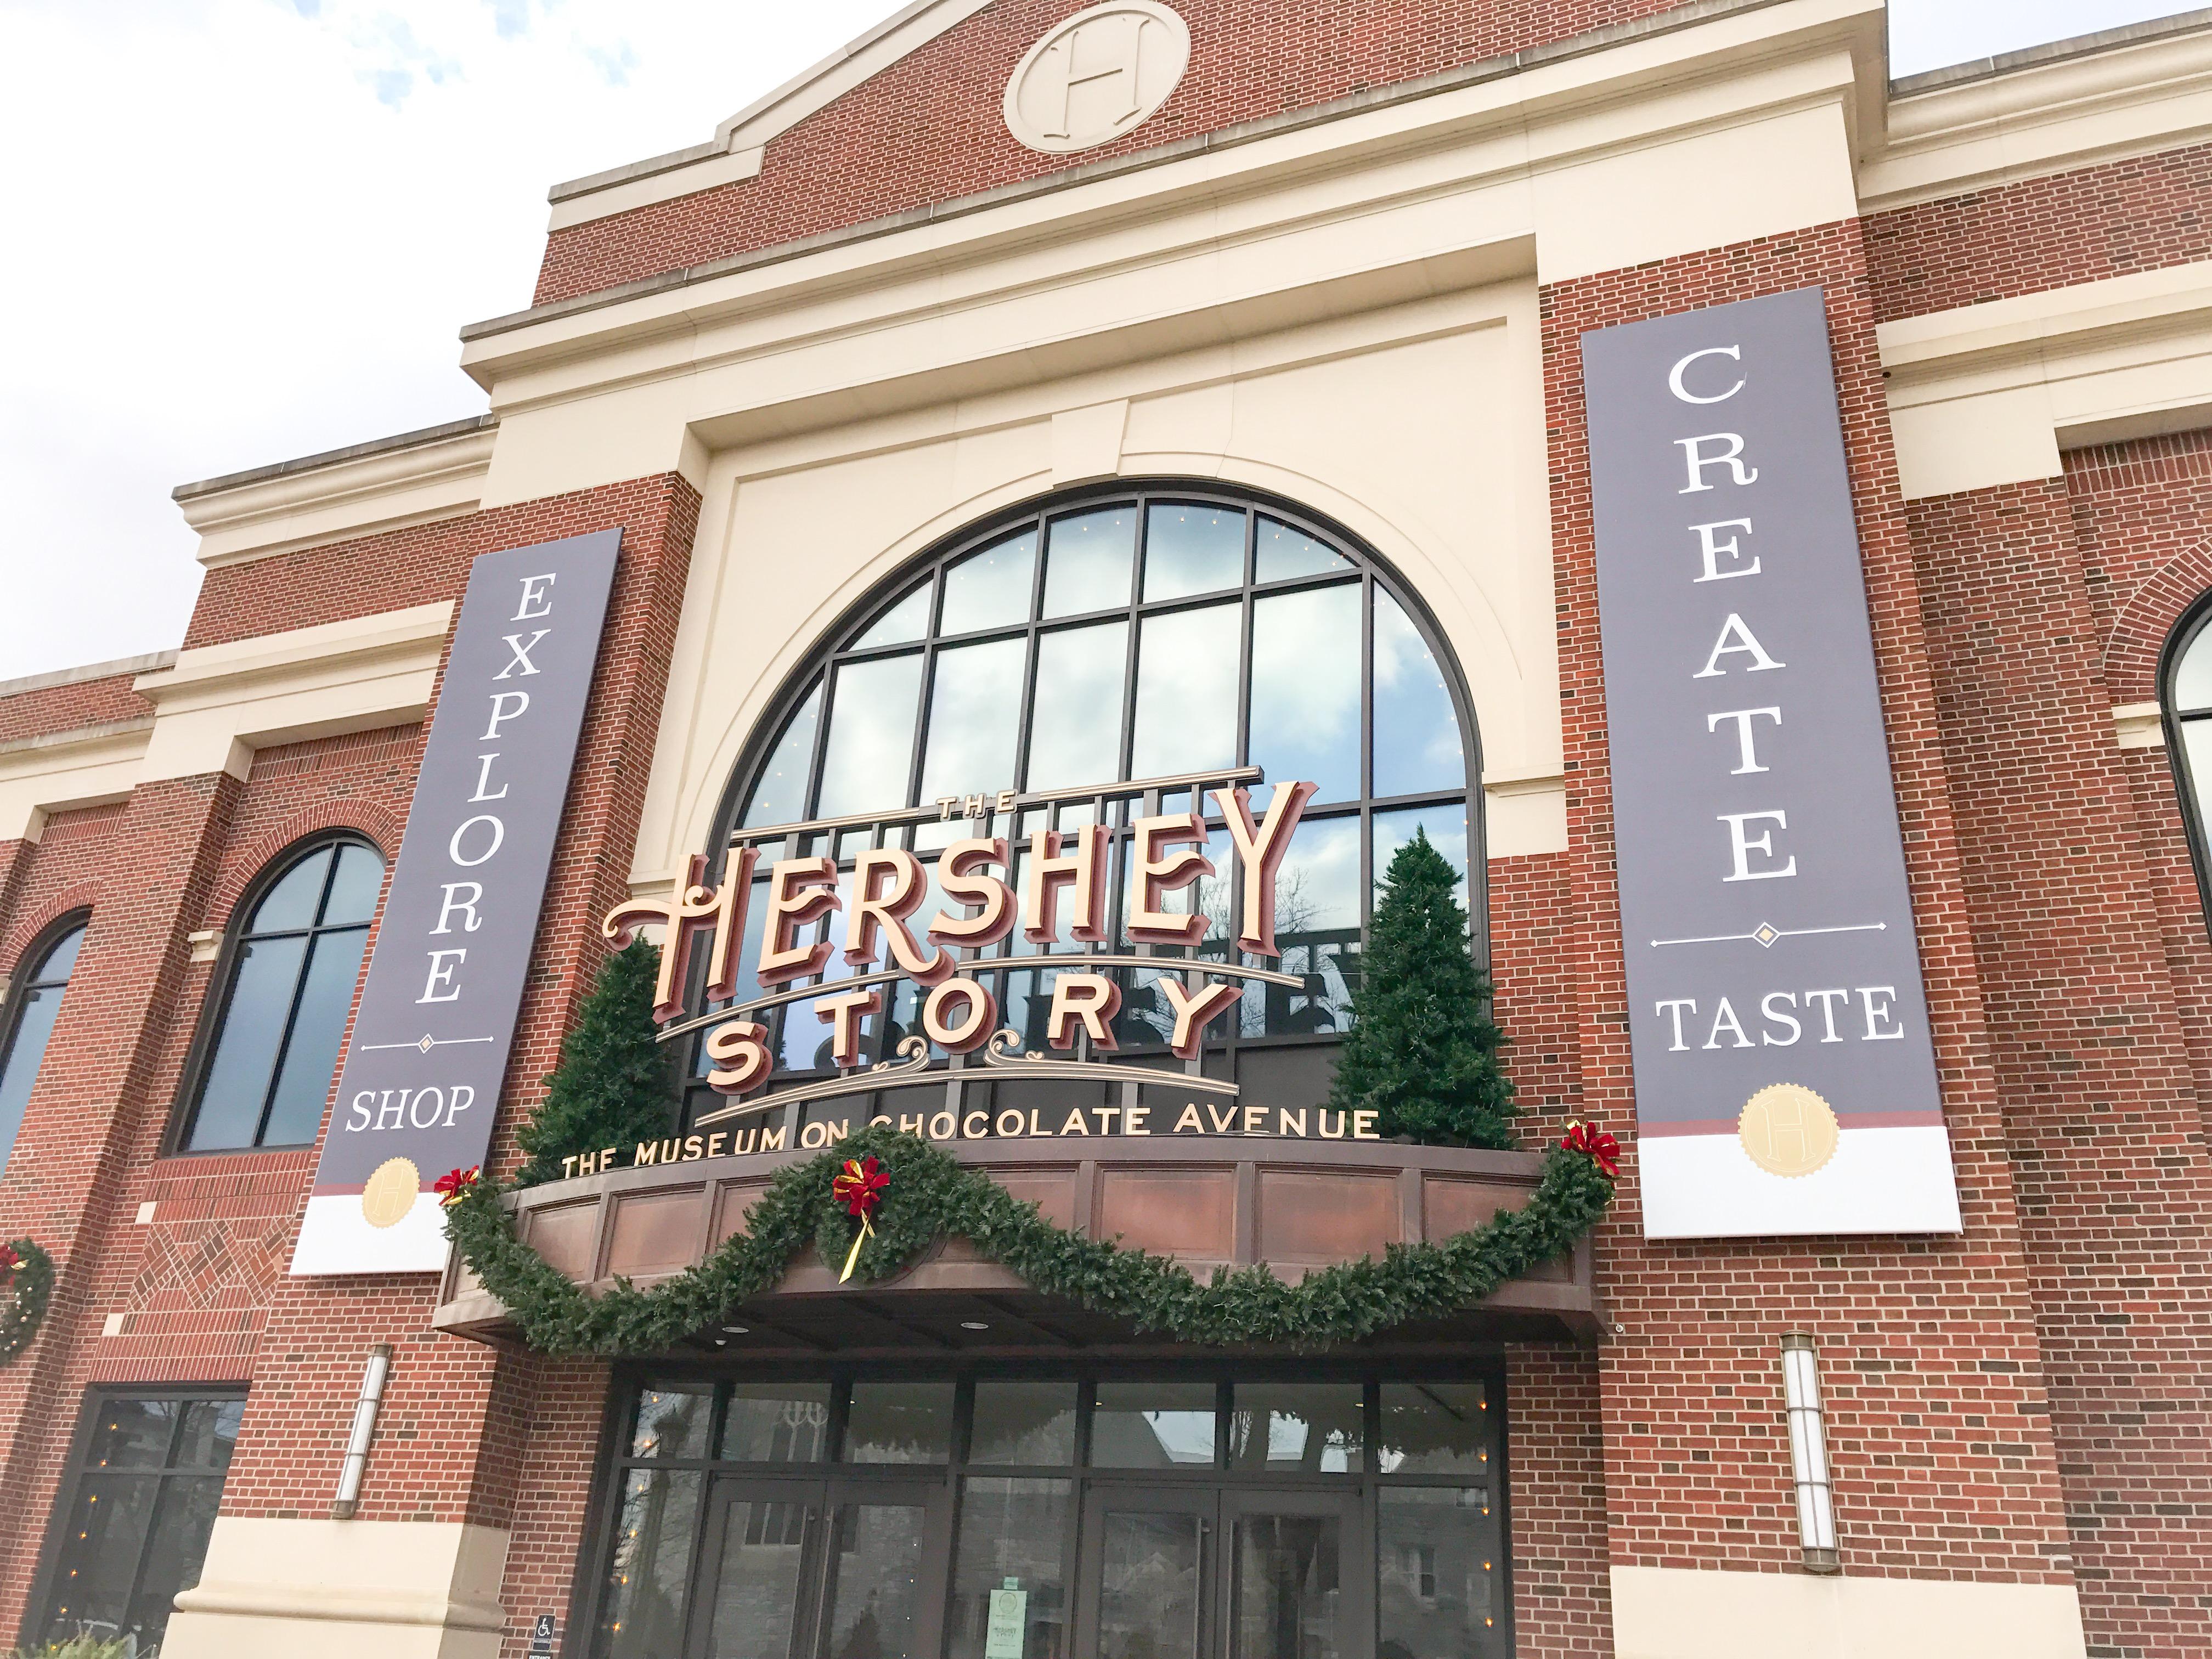 10 Reasons to Plan a Hersheypark Christmas Getaway